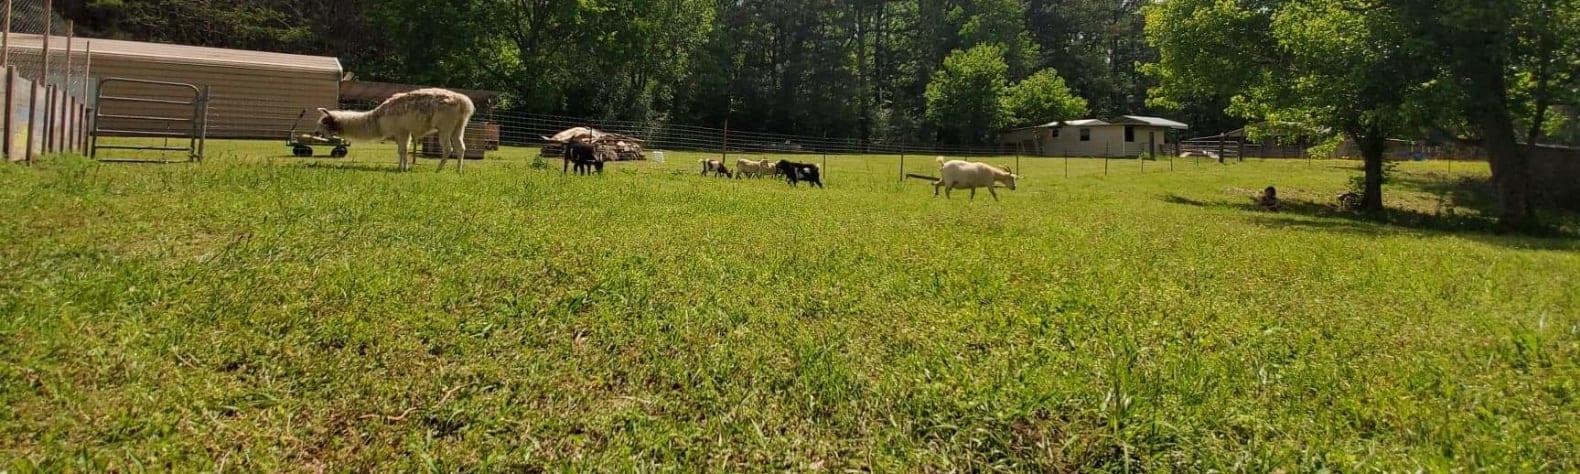 Crystal Valley Farm